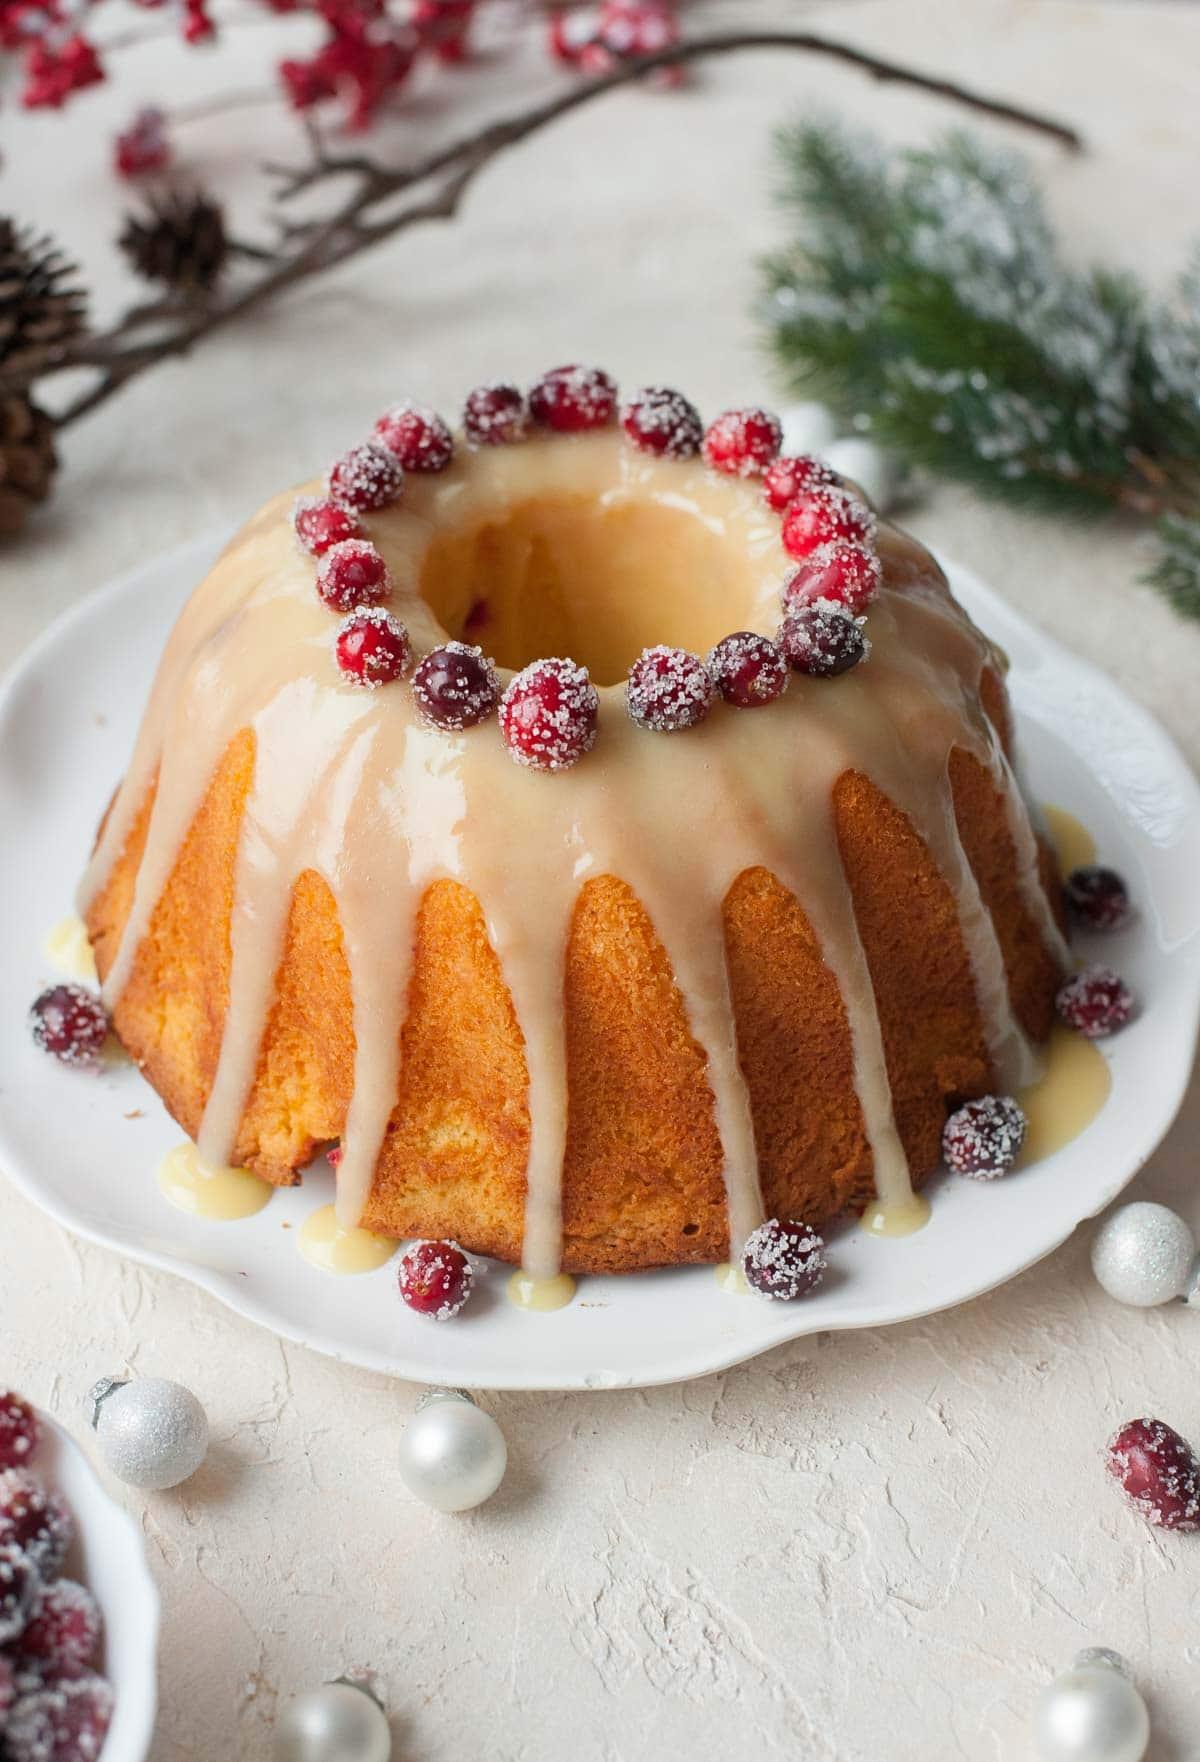 Cranberry orange bundt cake with white chocolate orange glaze and sugared cranberries.